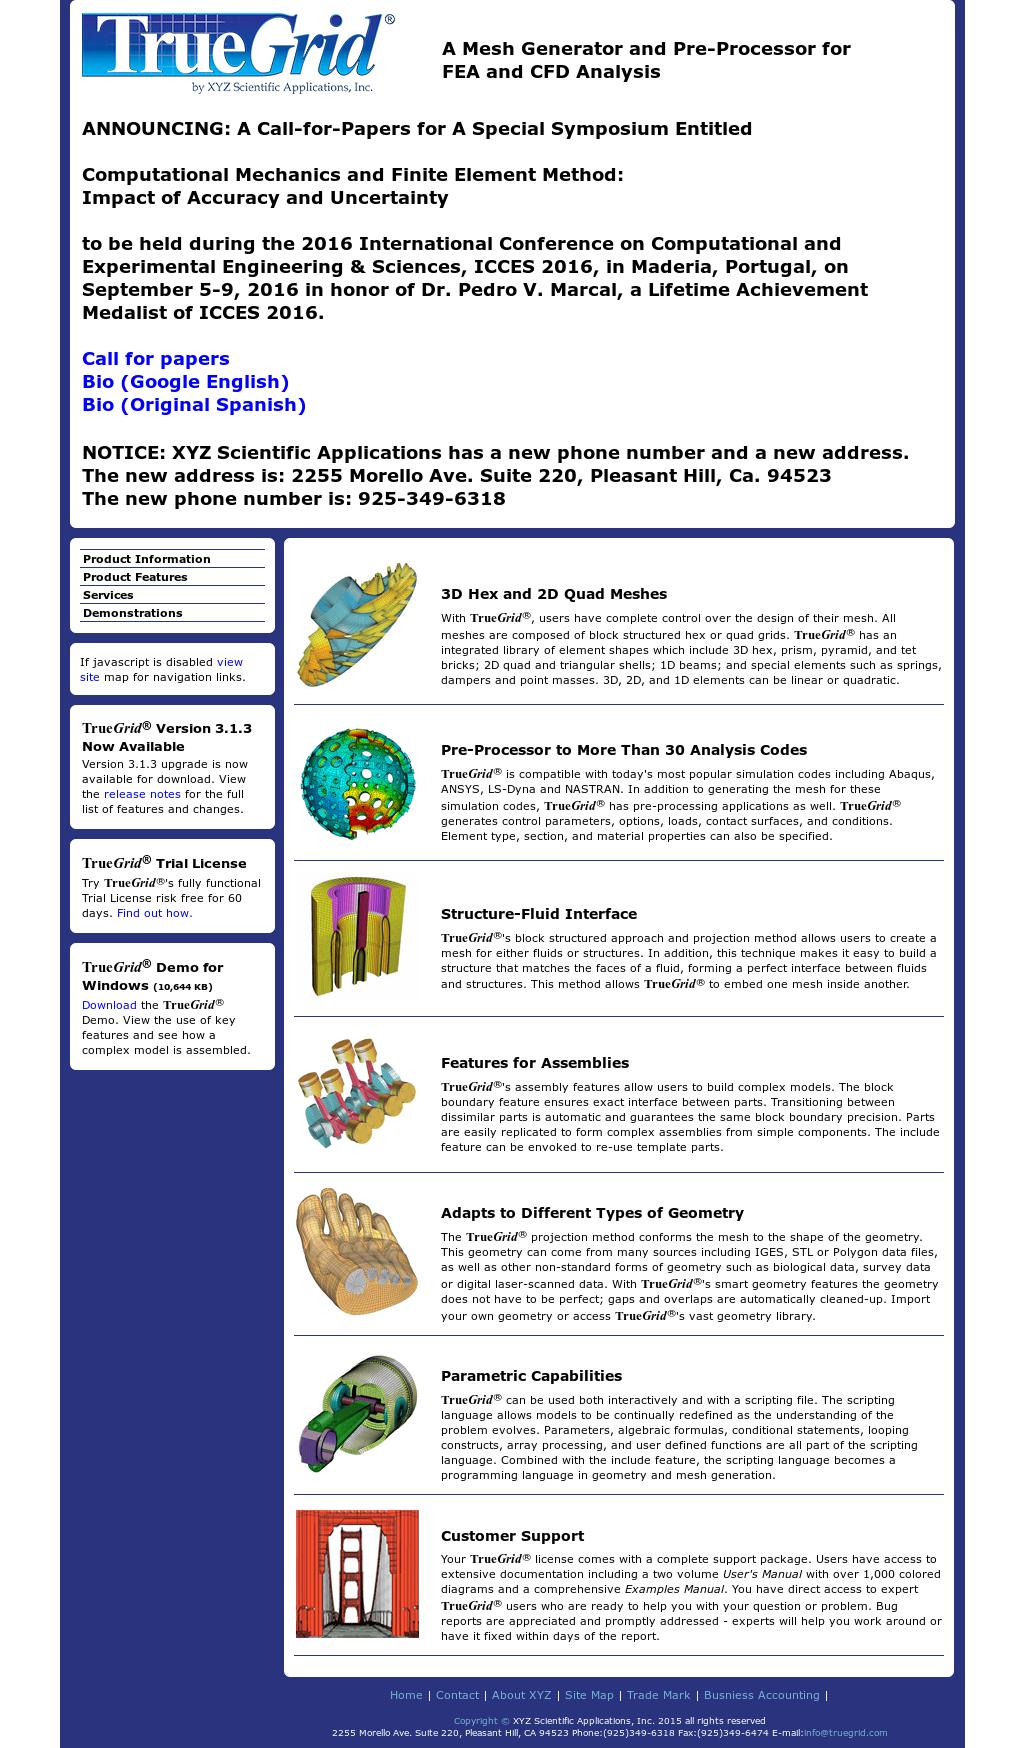 XYZ Scientific Applications Competitors, Revenue and